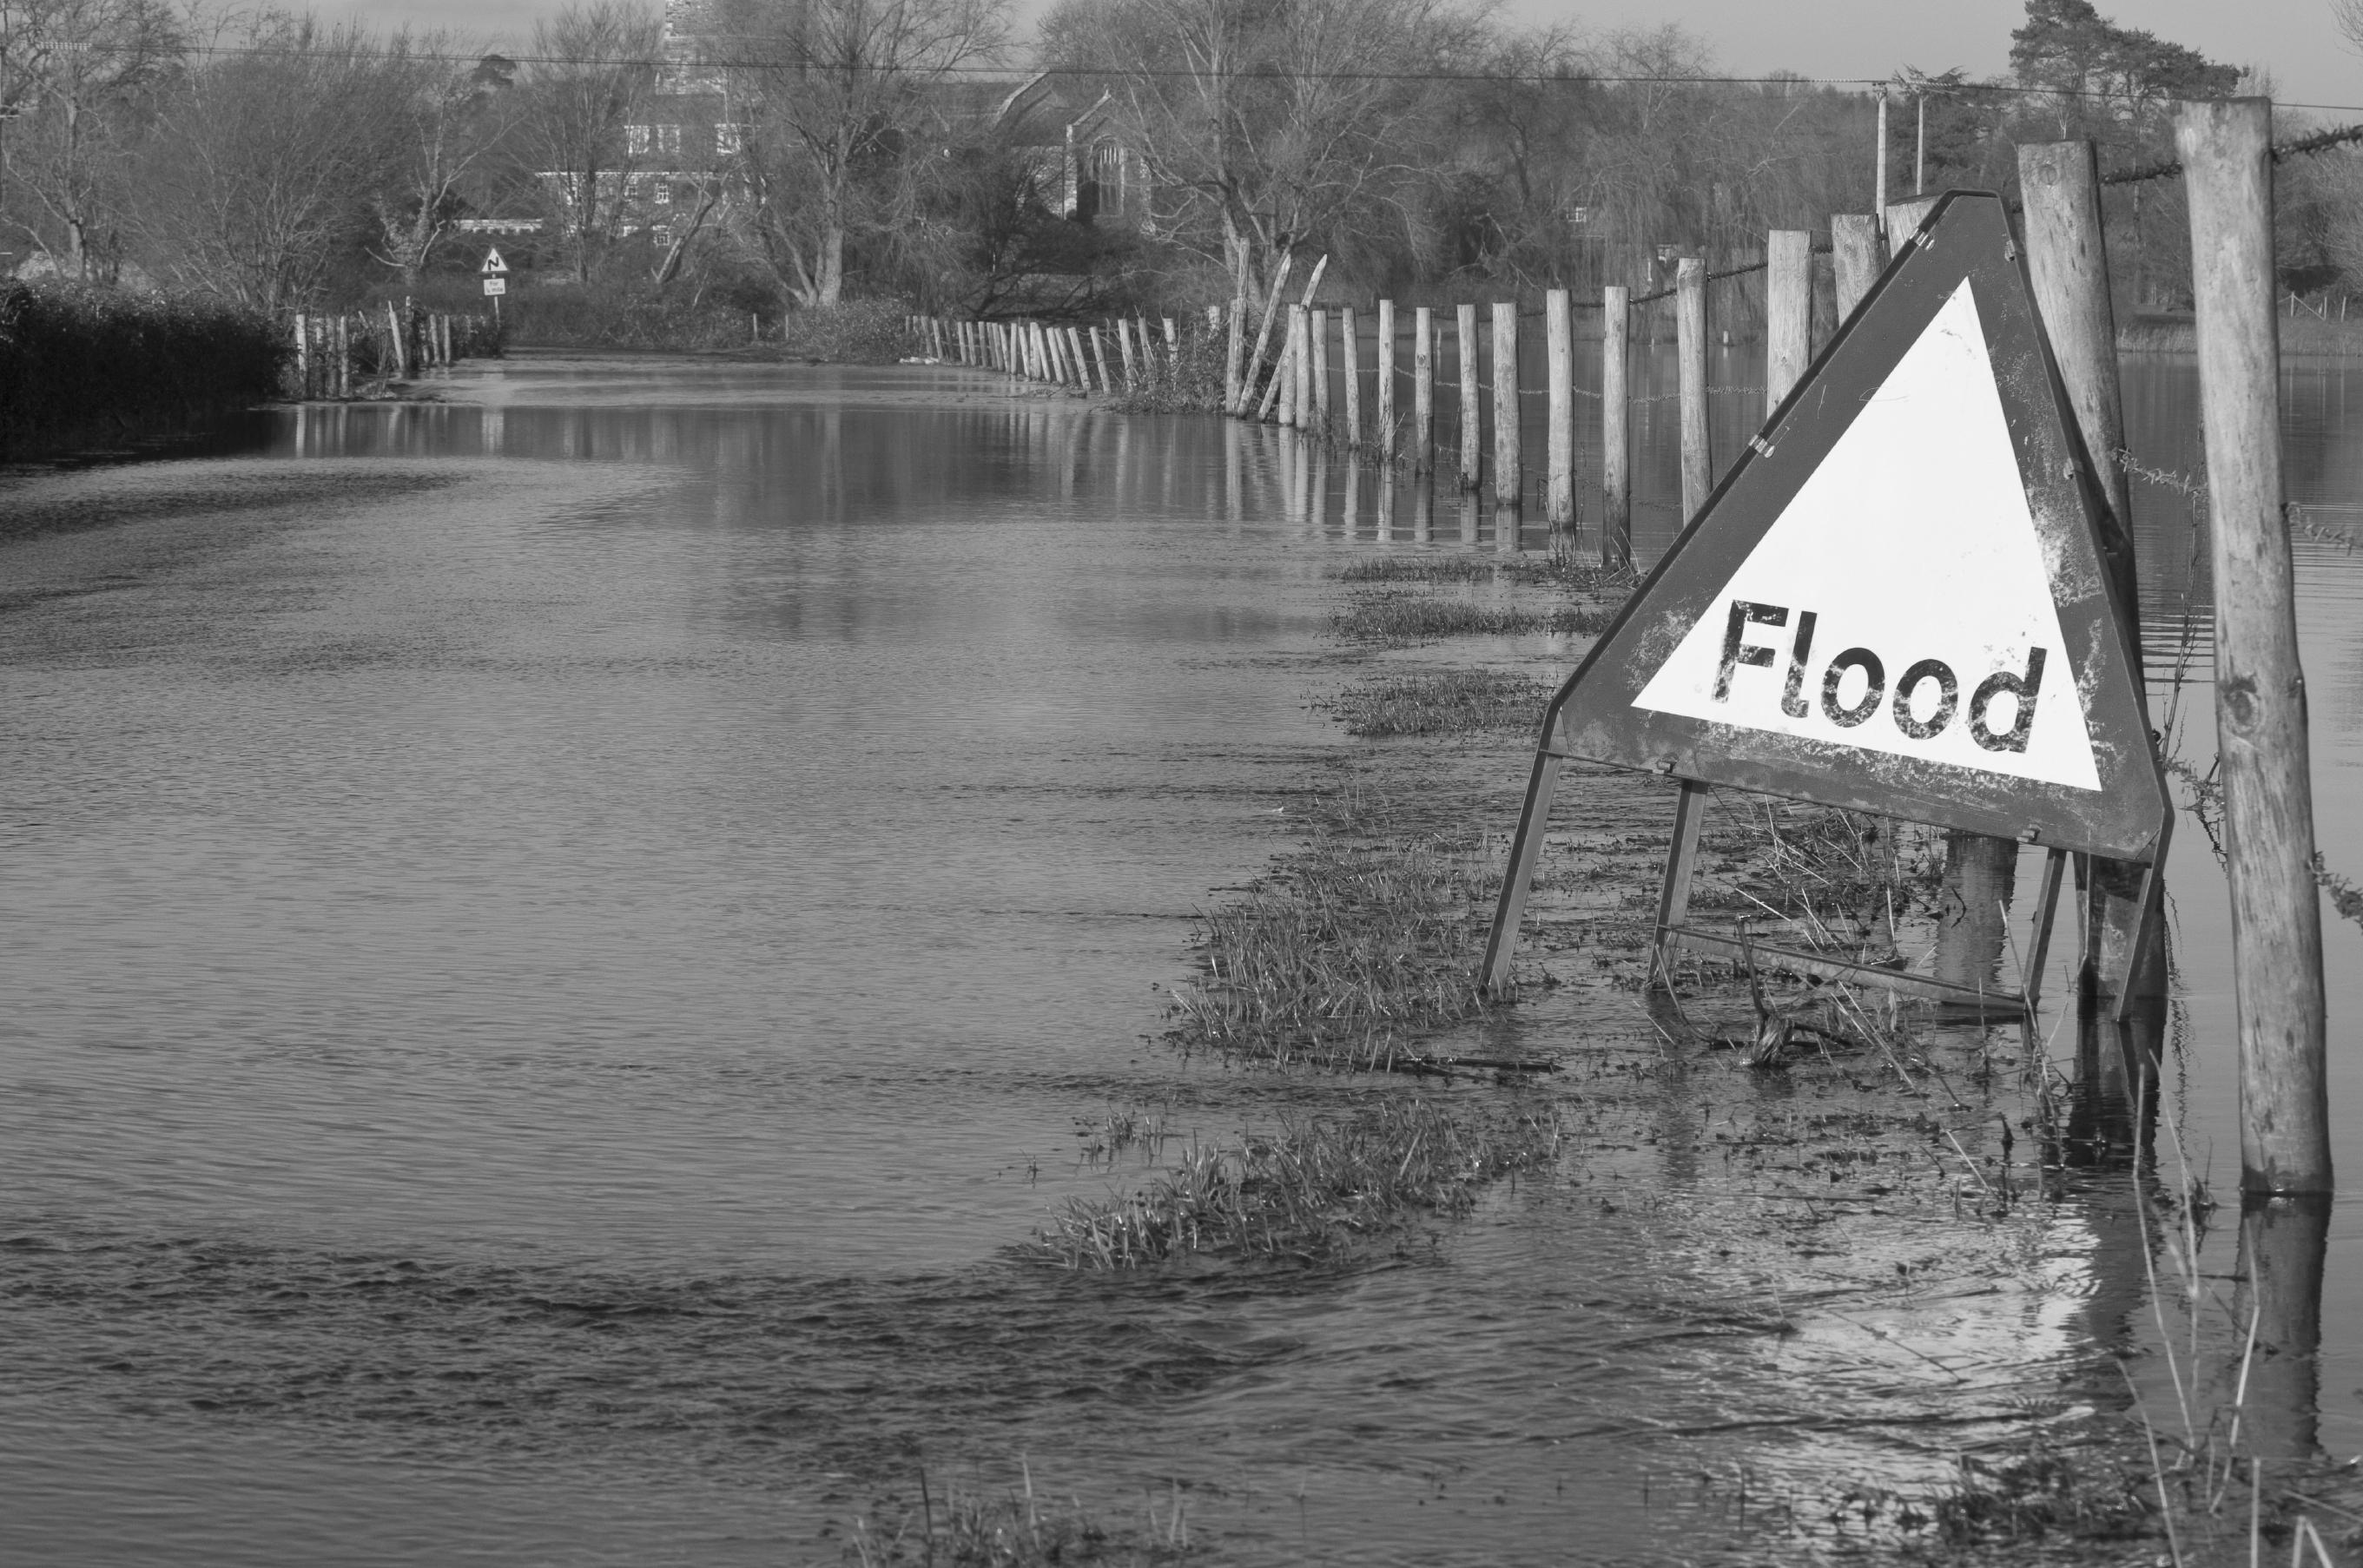 Flood sign where UK river burst its banks